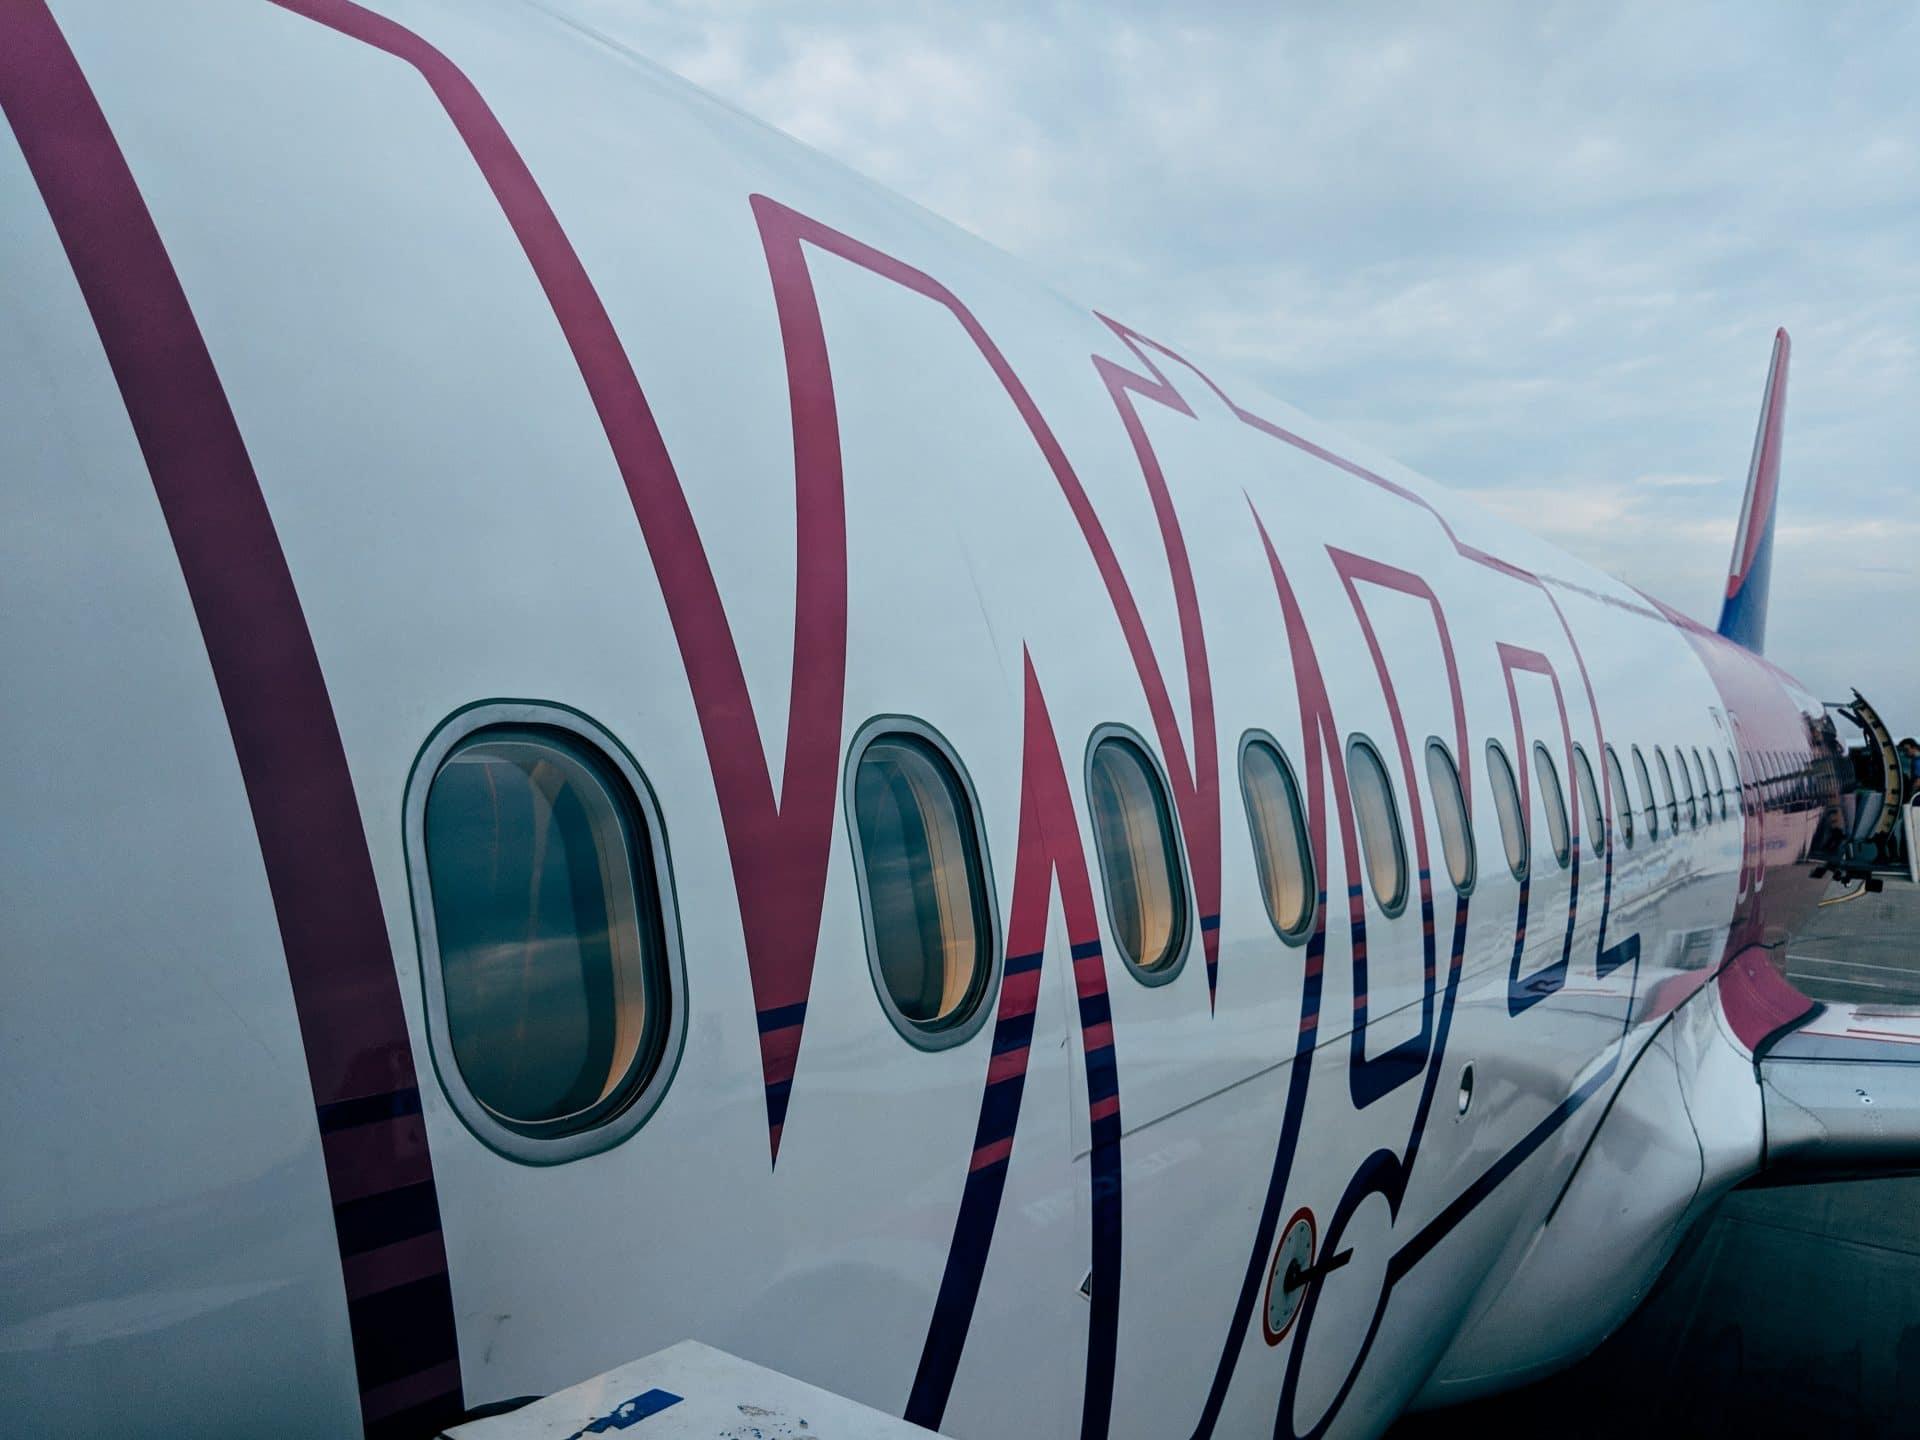 Wizz Air ZjLwMU325y8 Unsplash